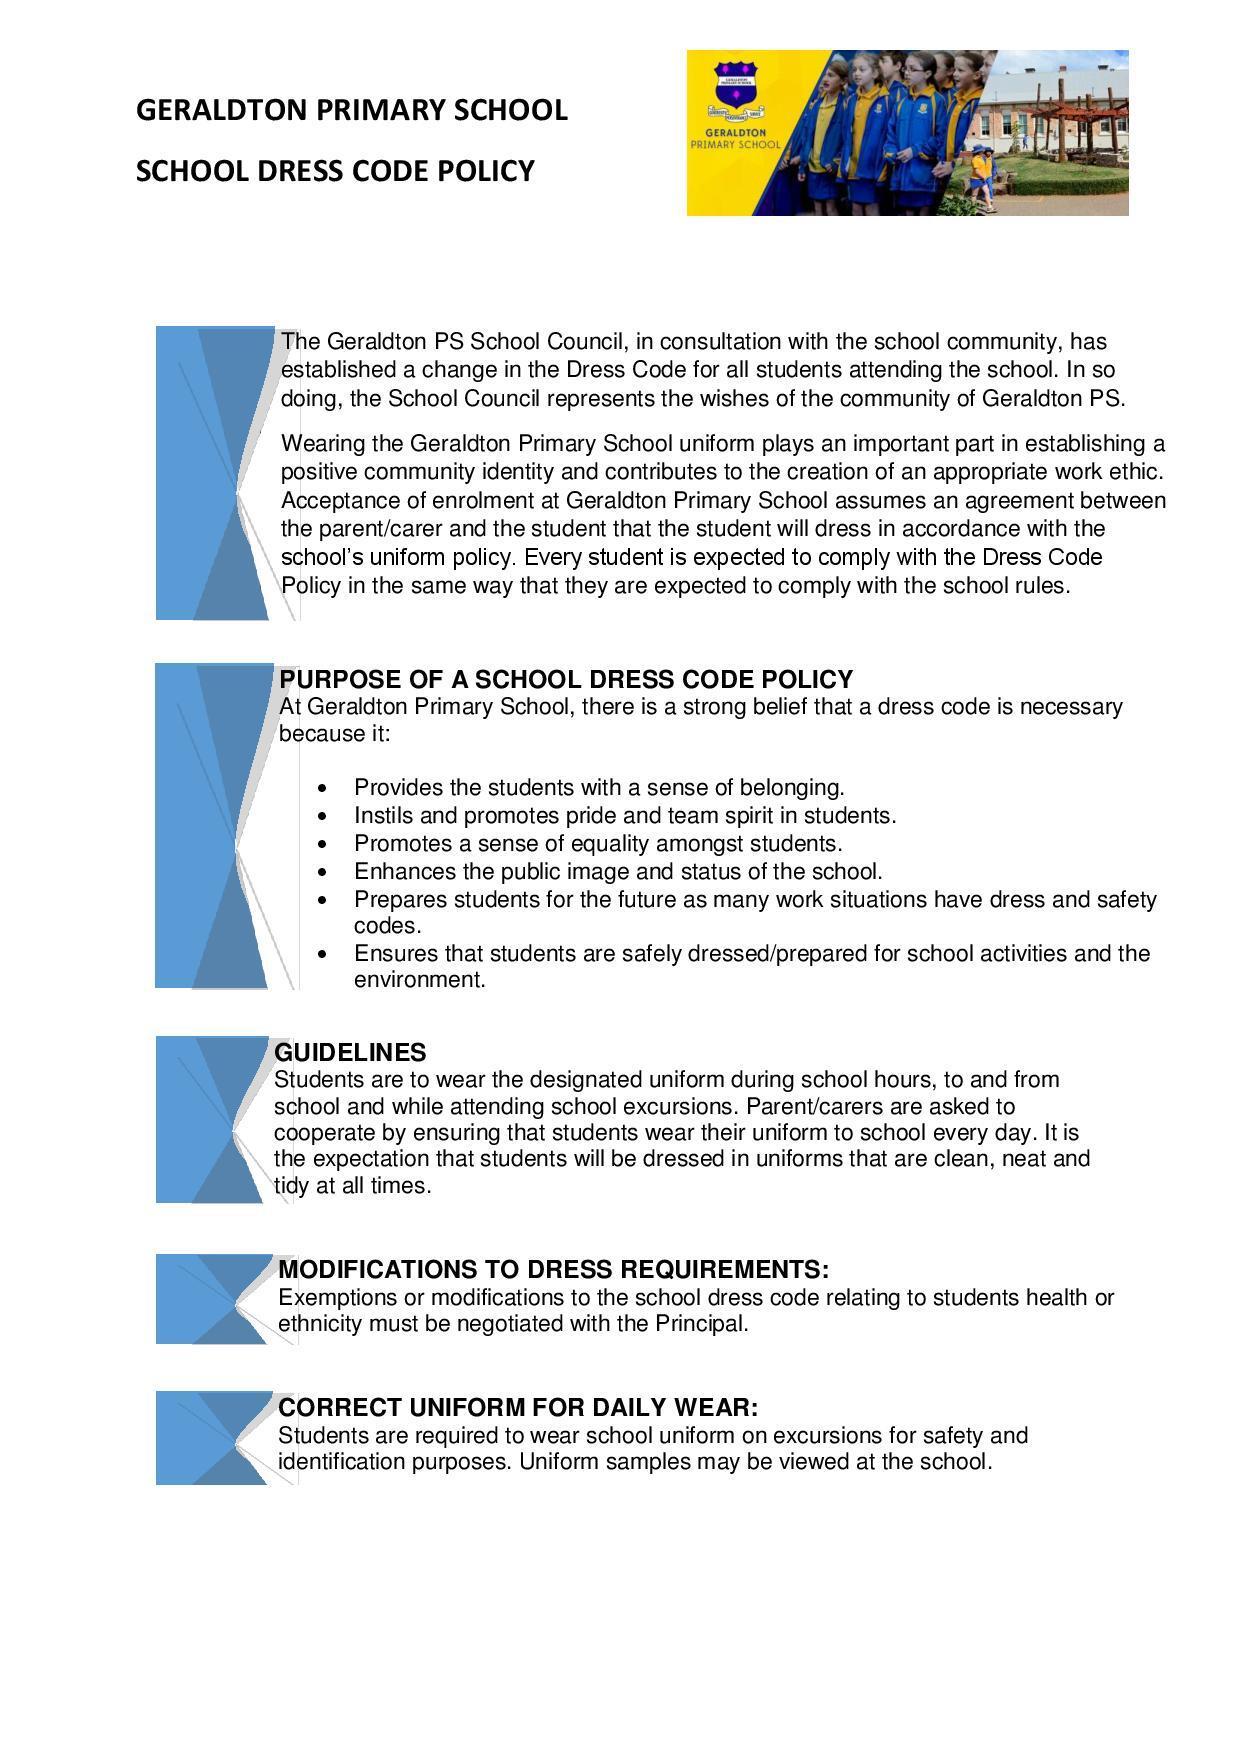 2018 Geraldton PS School Dress Code Policy - Draft - Nov 2017-page-001